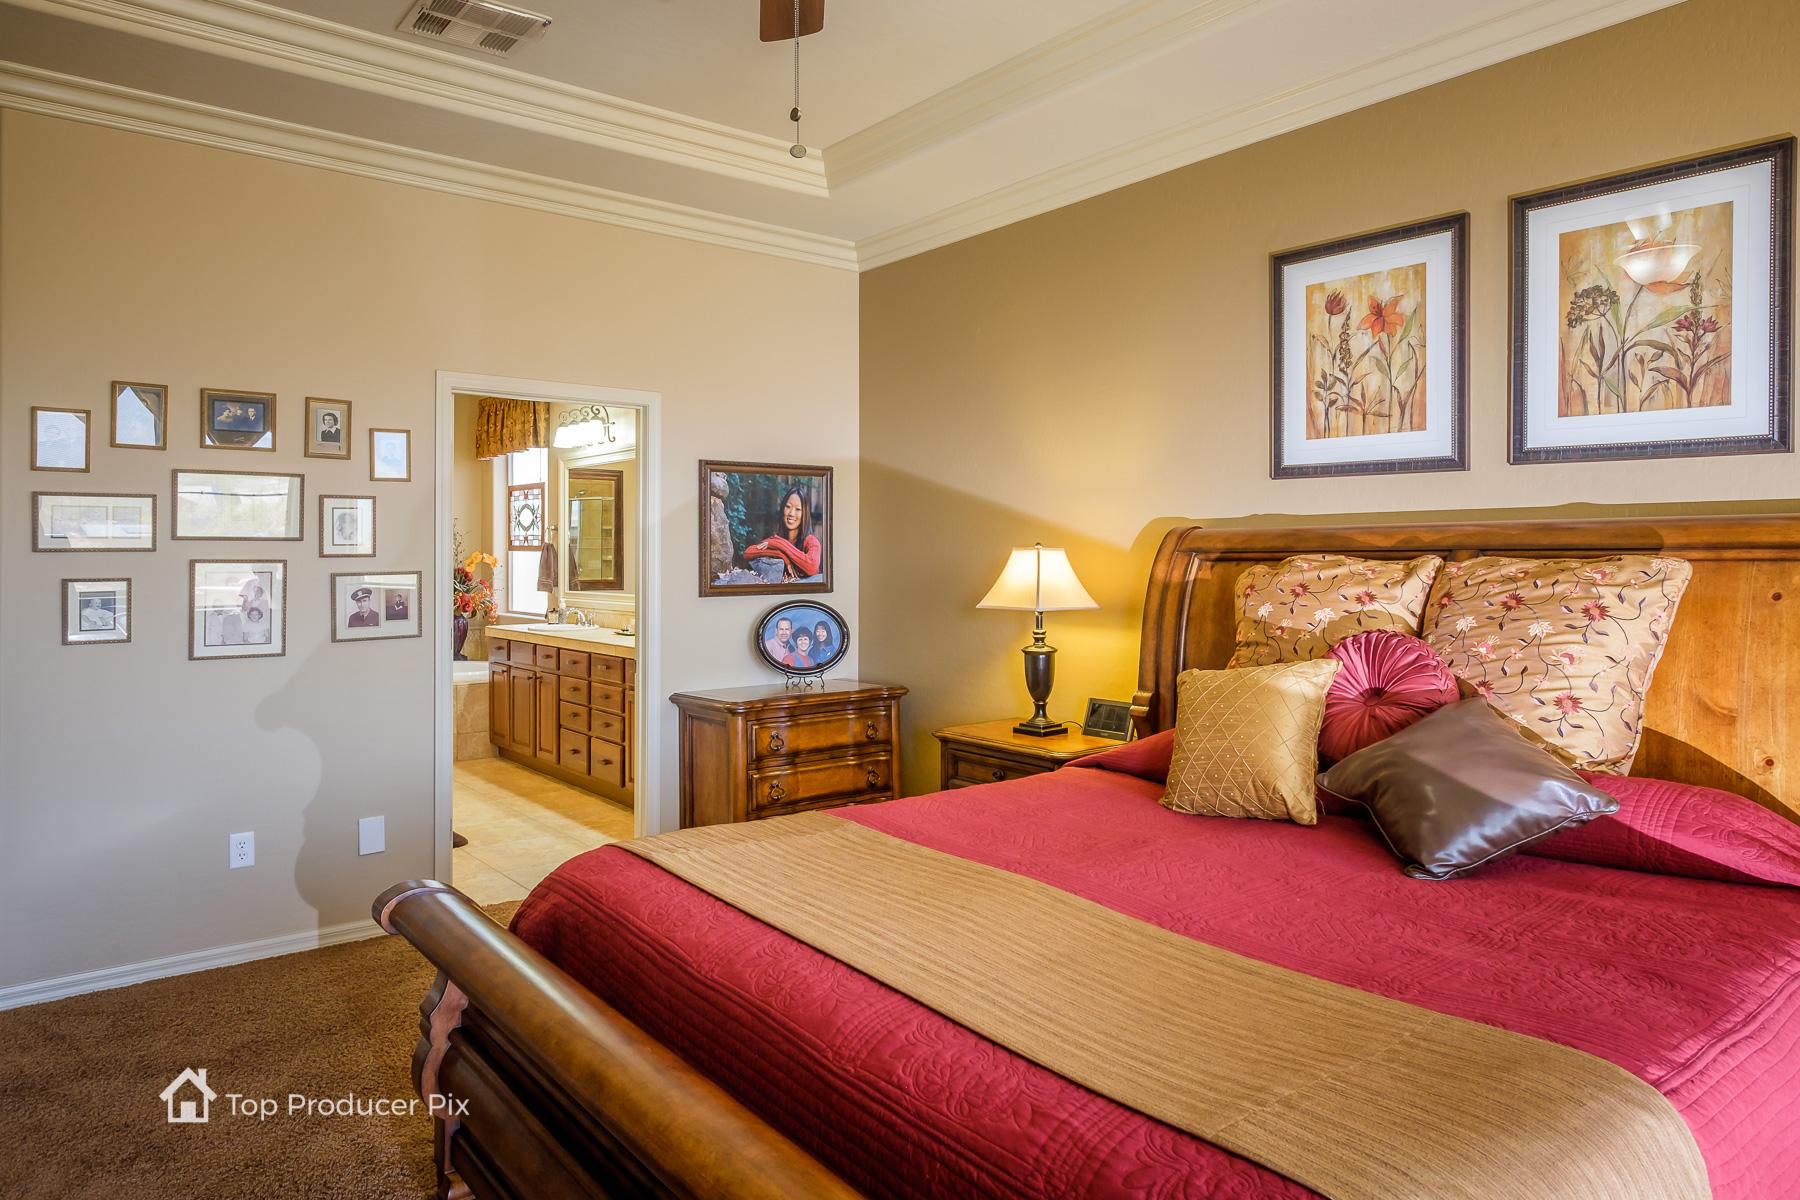 Master Suite - Bedroom, Bathroom, Storage